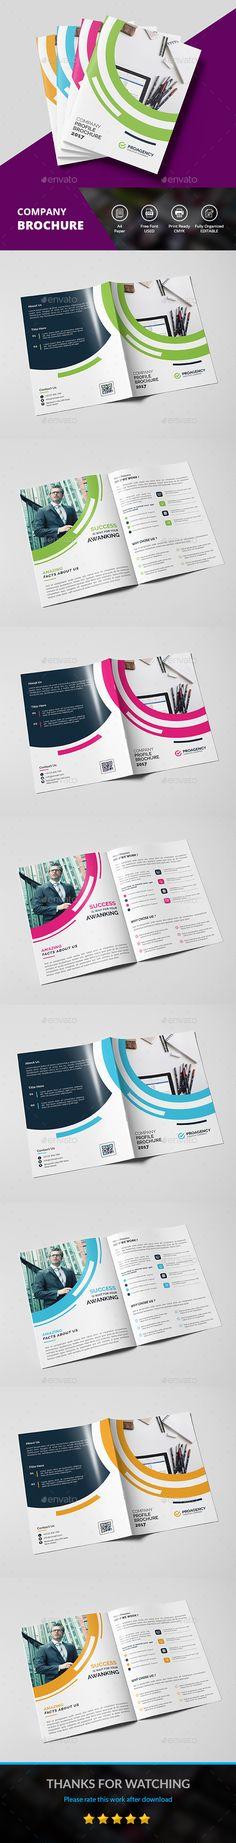 Graphic Design Portfolio Brochure Template Publication Design - sell sheet template